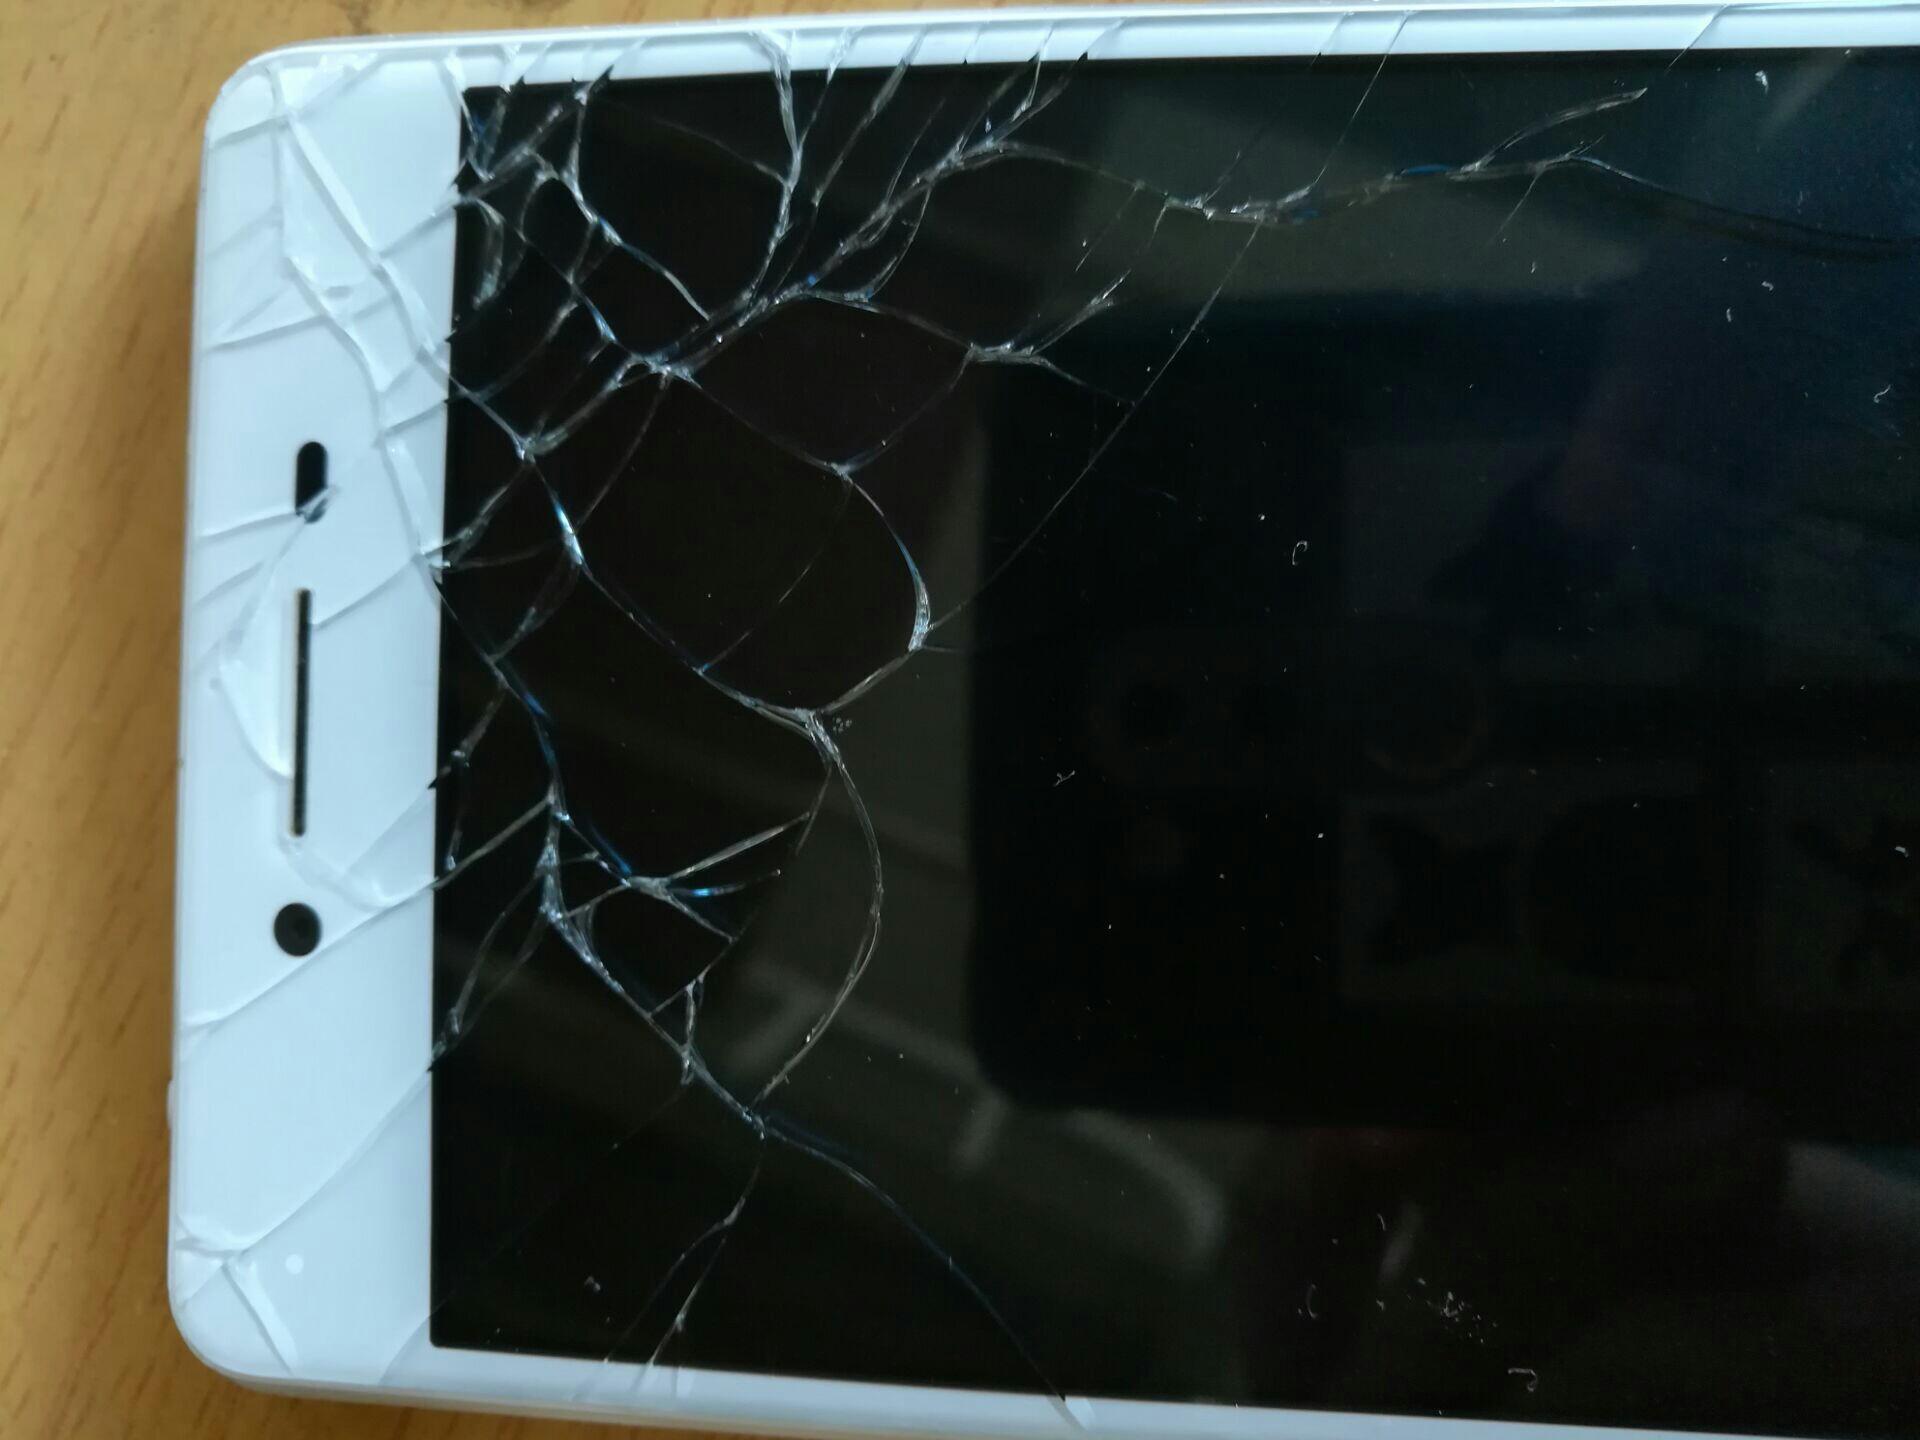 oppor7屏幕碎了换屏多少钱